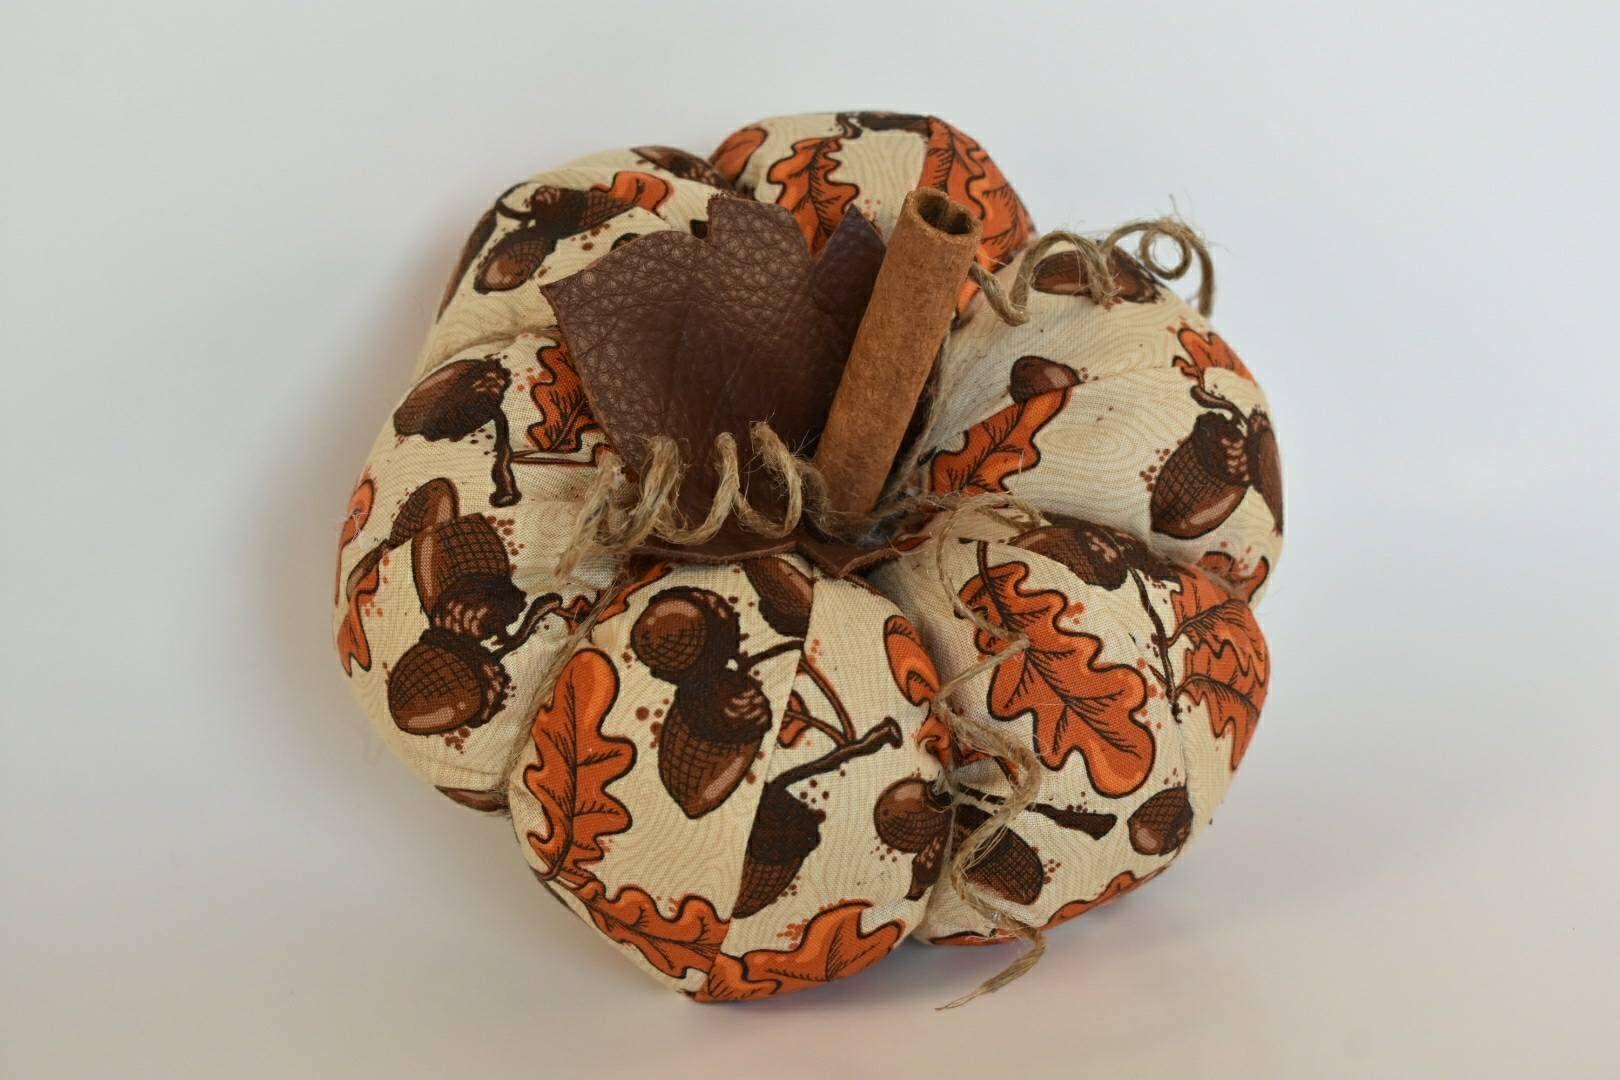 Pumpkin, Fall Decor, Harvest, Acorn, Leaves, Autumn